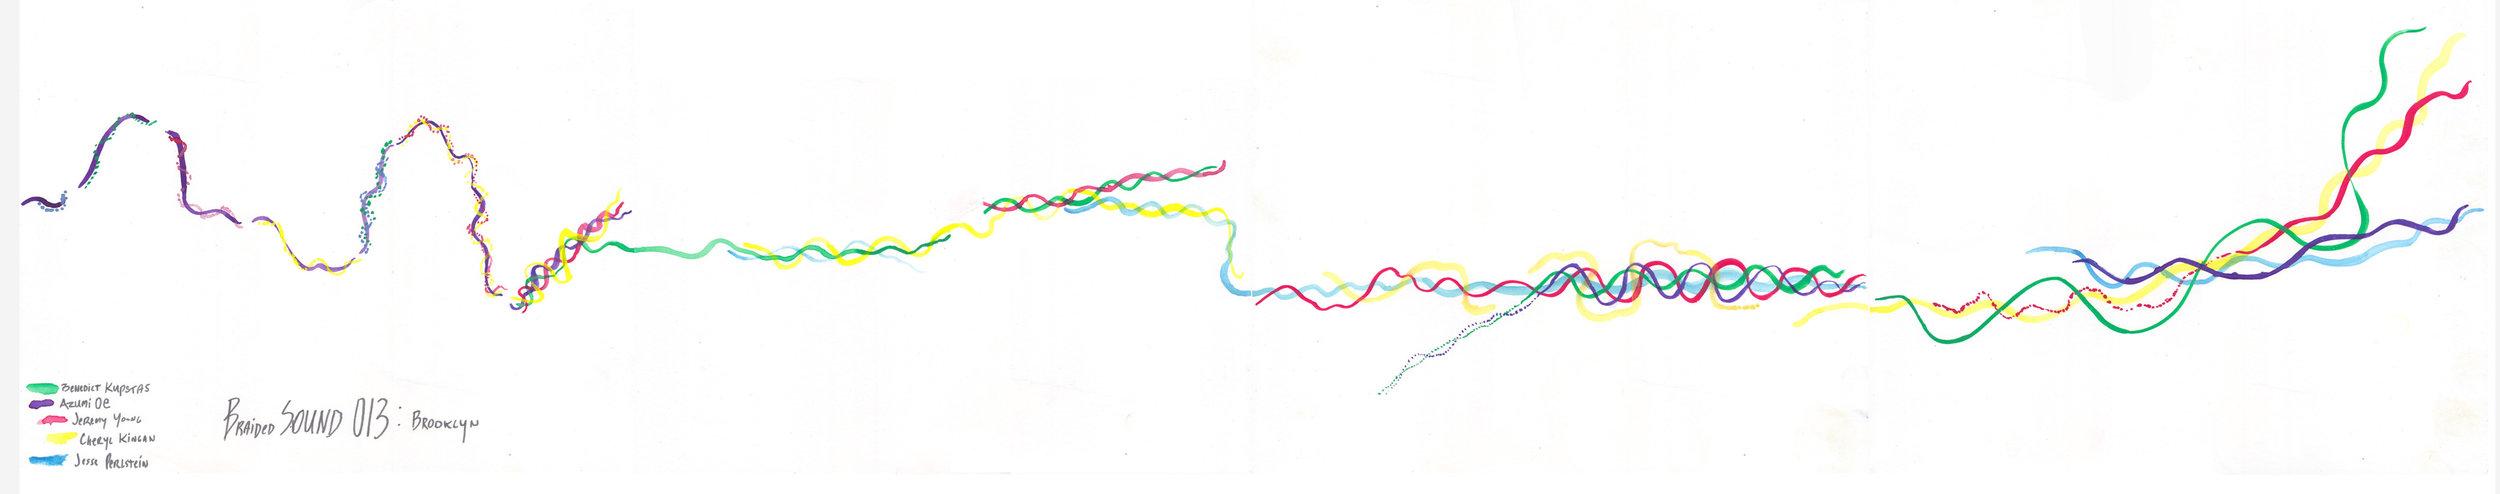 braided bk score.jpg